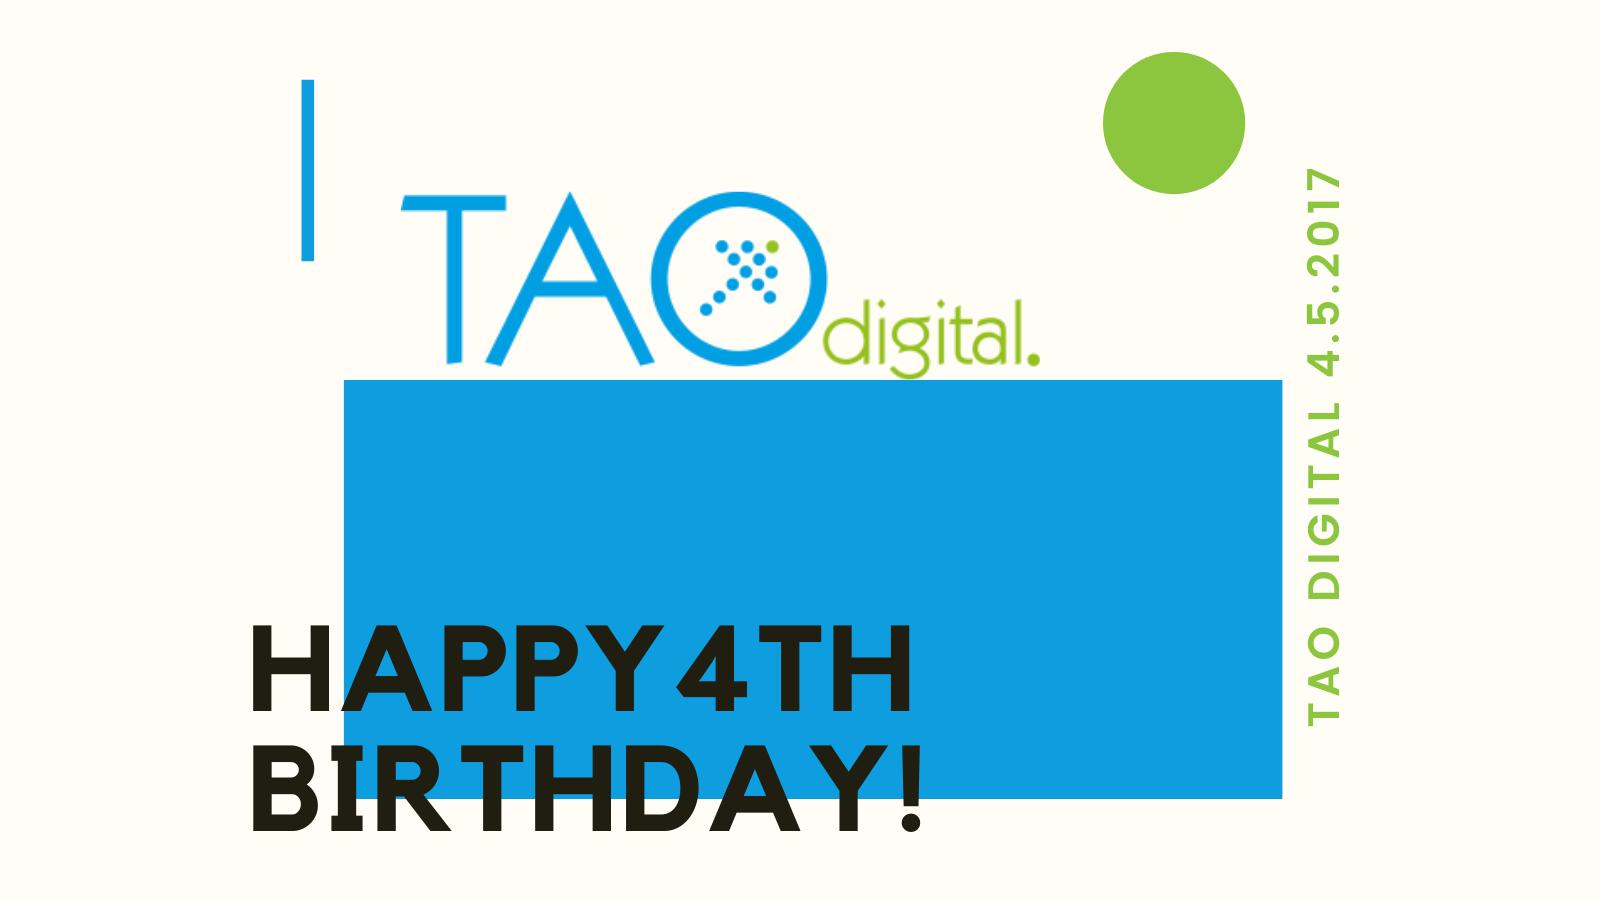 Graphic saying 'Happy 4th birthday Tao'